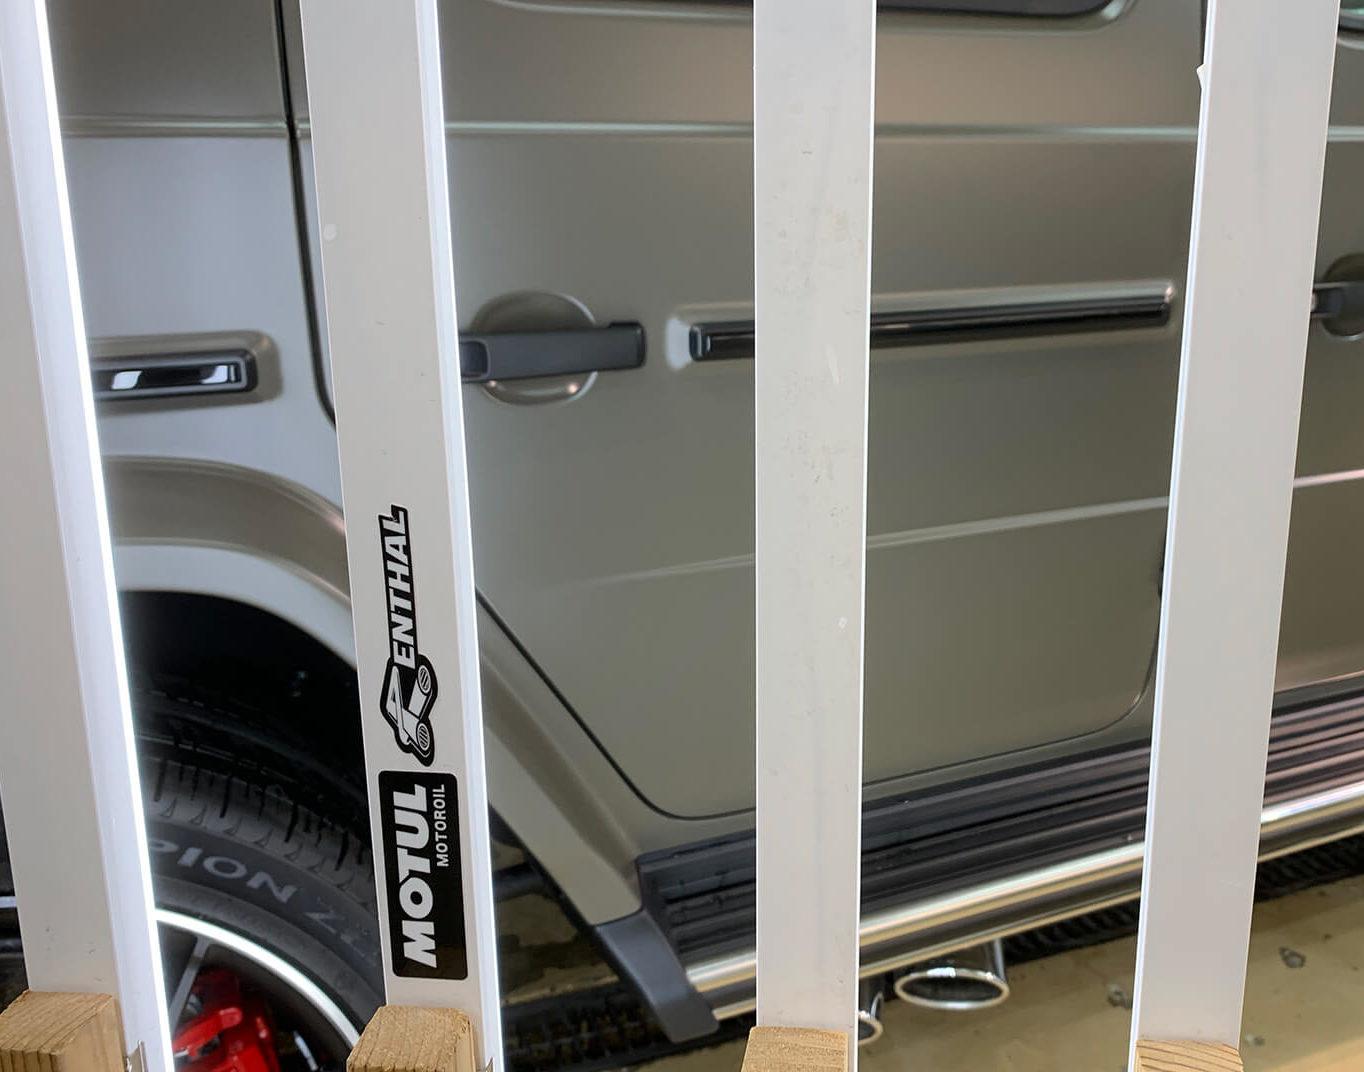 Mercedes-AMG G63 manufaktur Edition のコーティングを施工しているところ